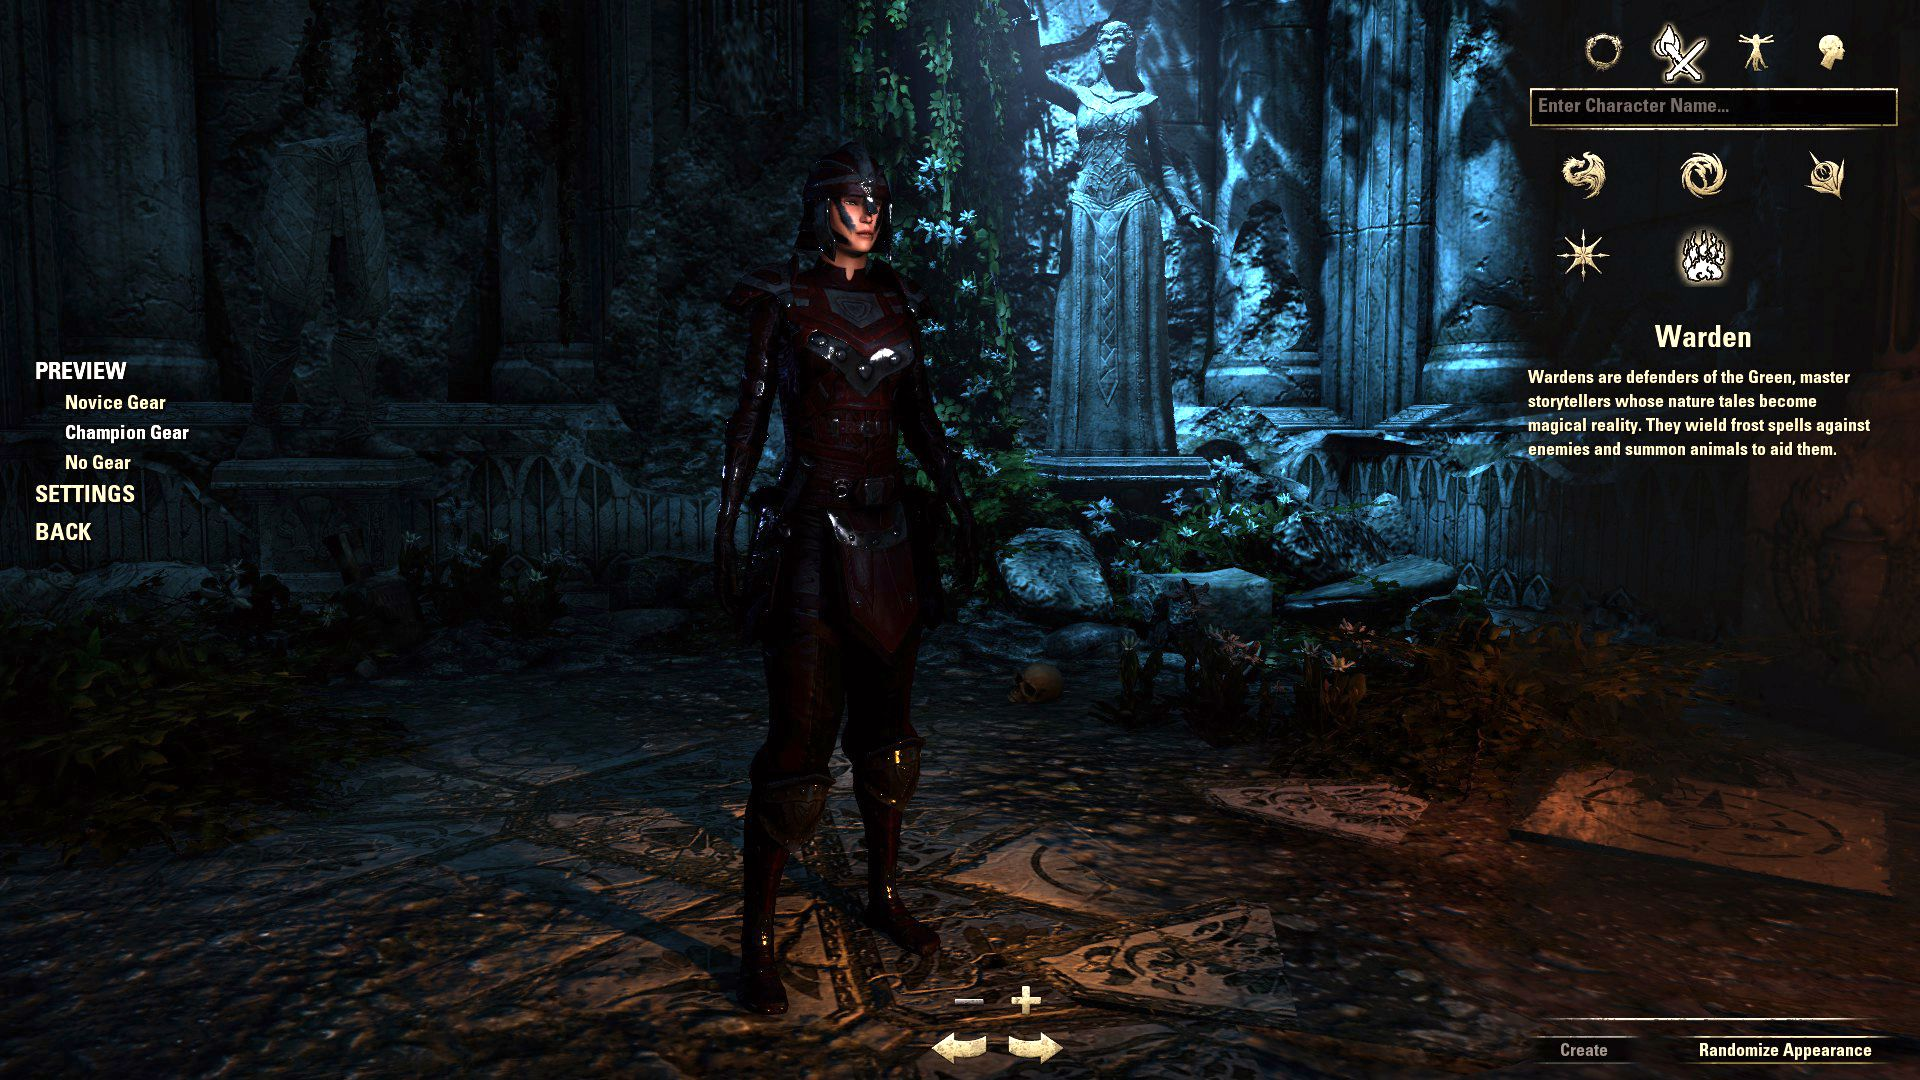 Warden, The Elder Scrolls Online Class